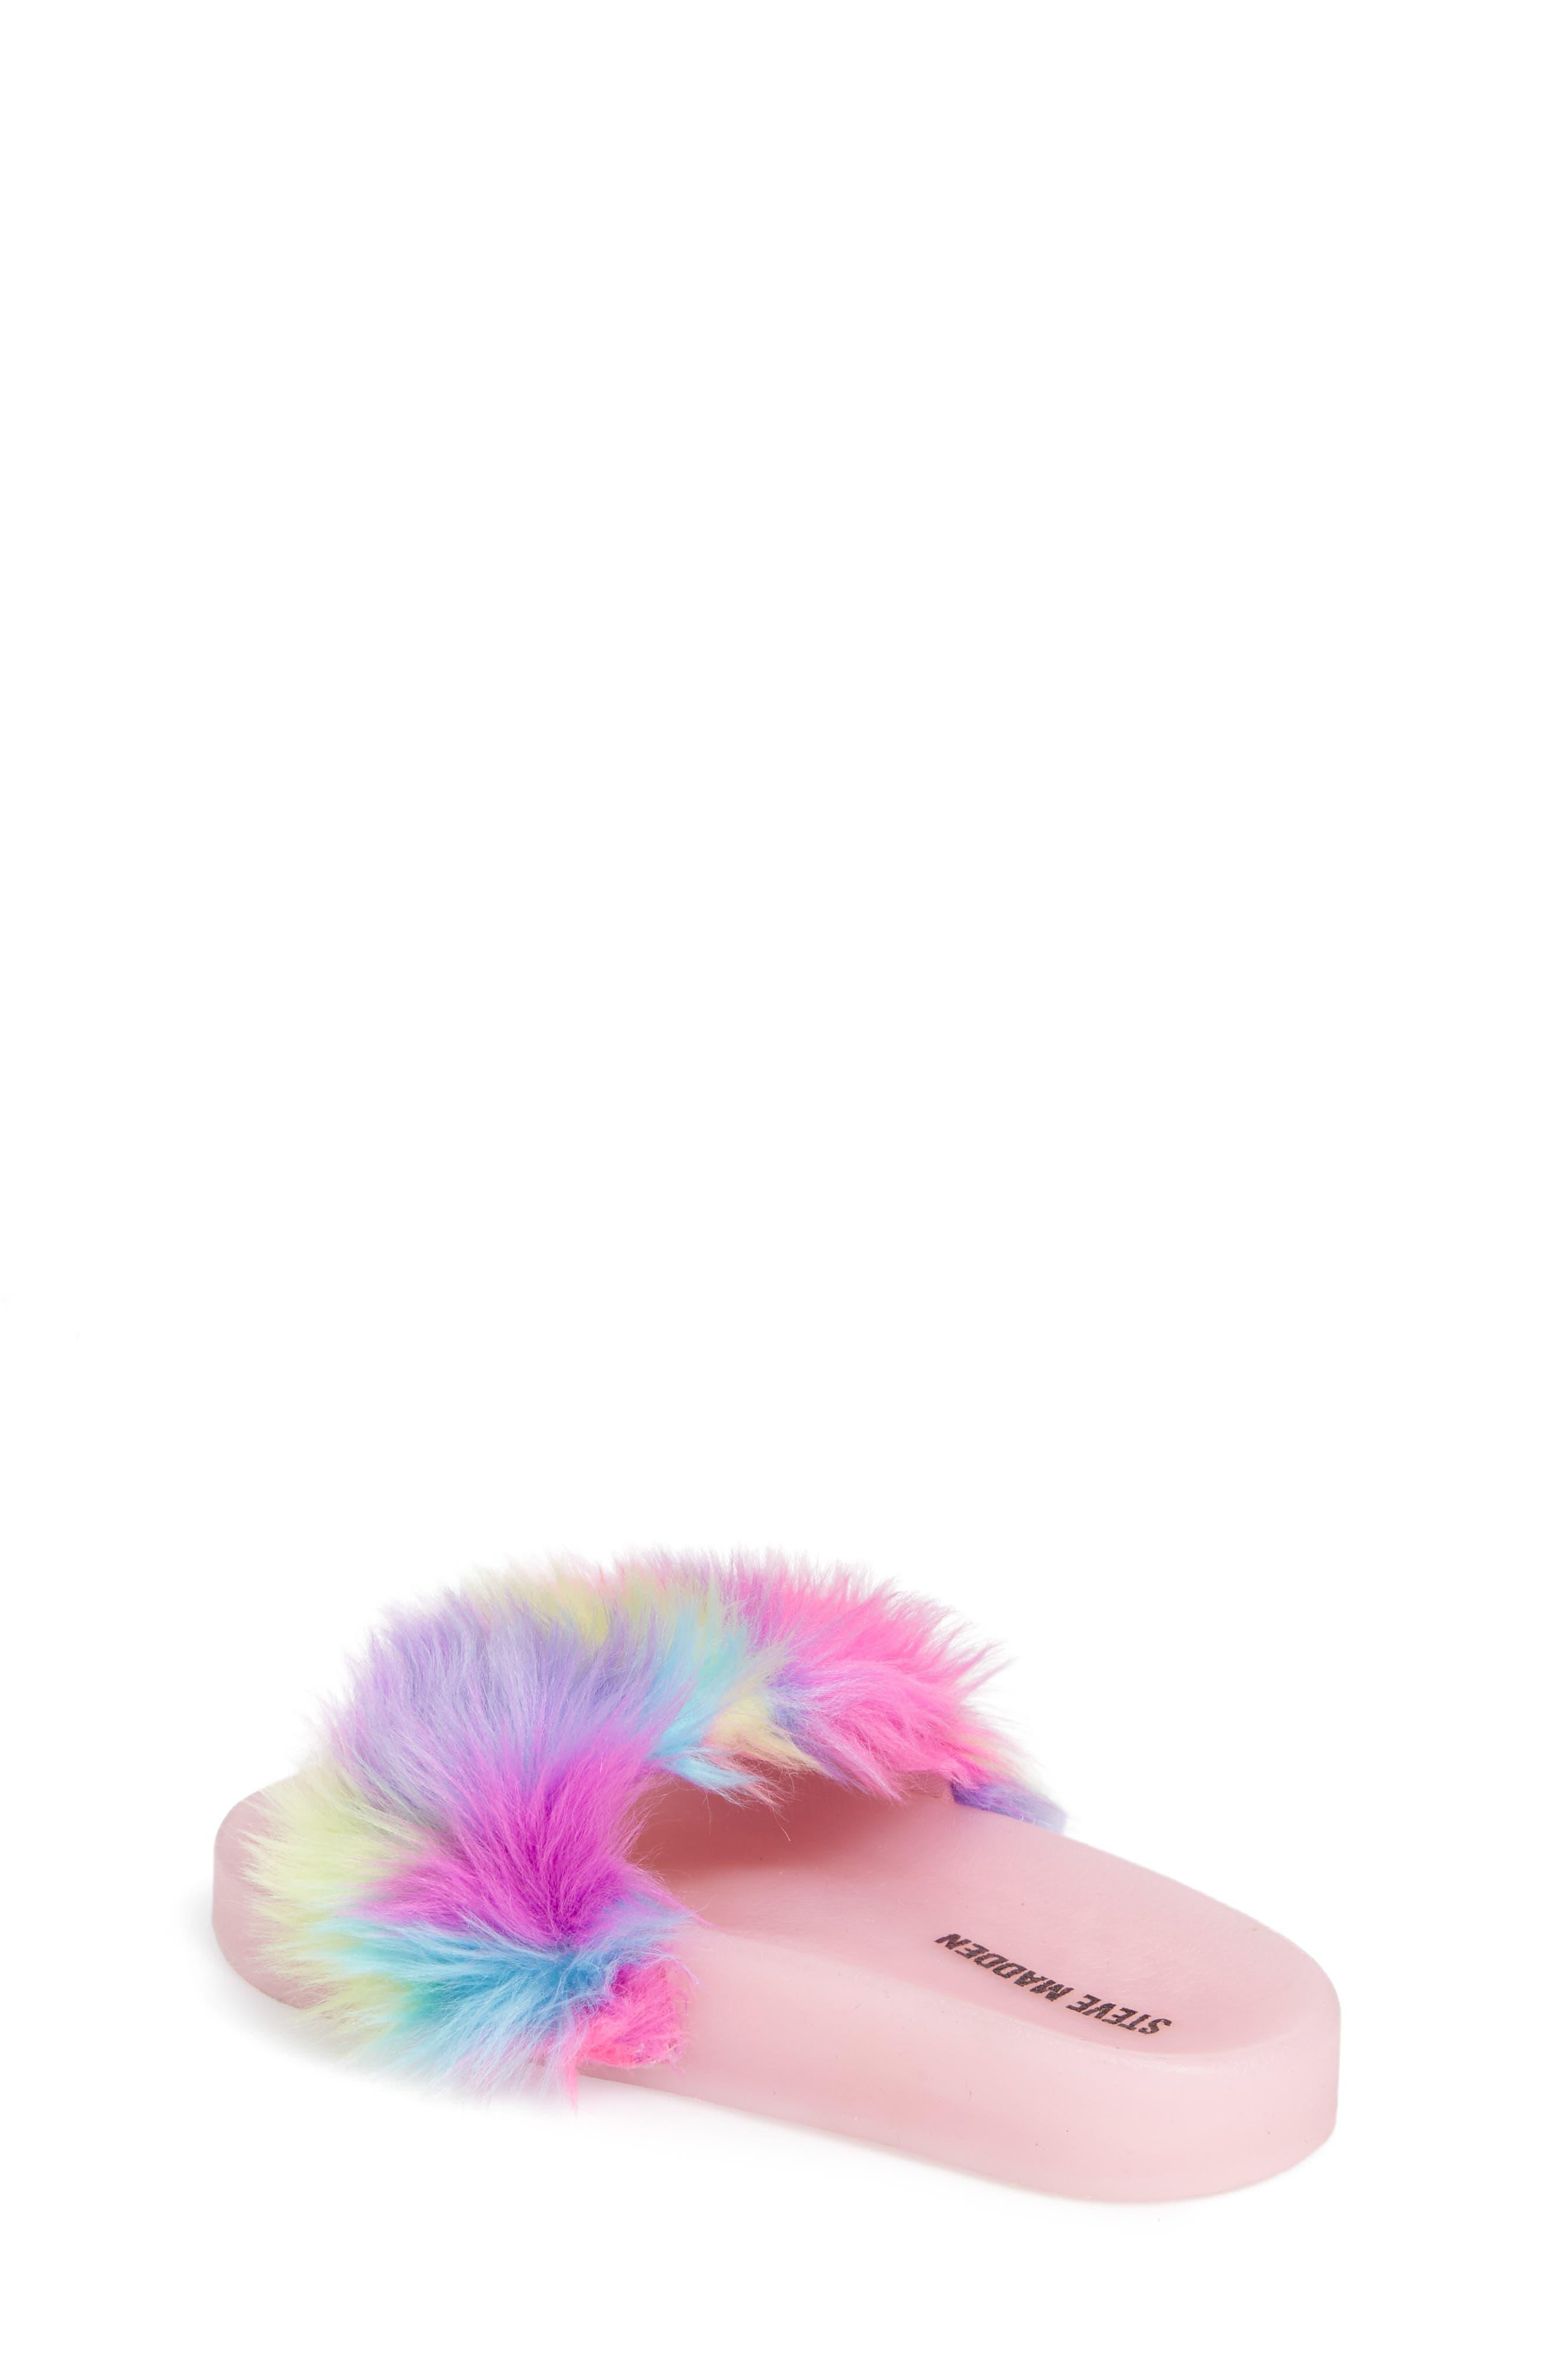 Jlights Faux Fur Light-Up Slide Sandal,                             Alternate thumbnail 2, color,                             650